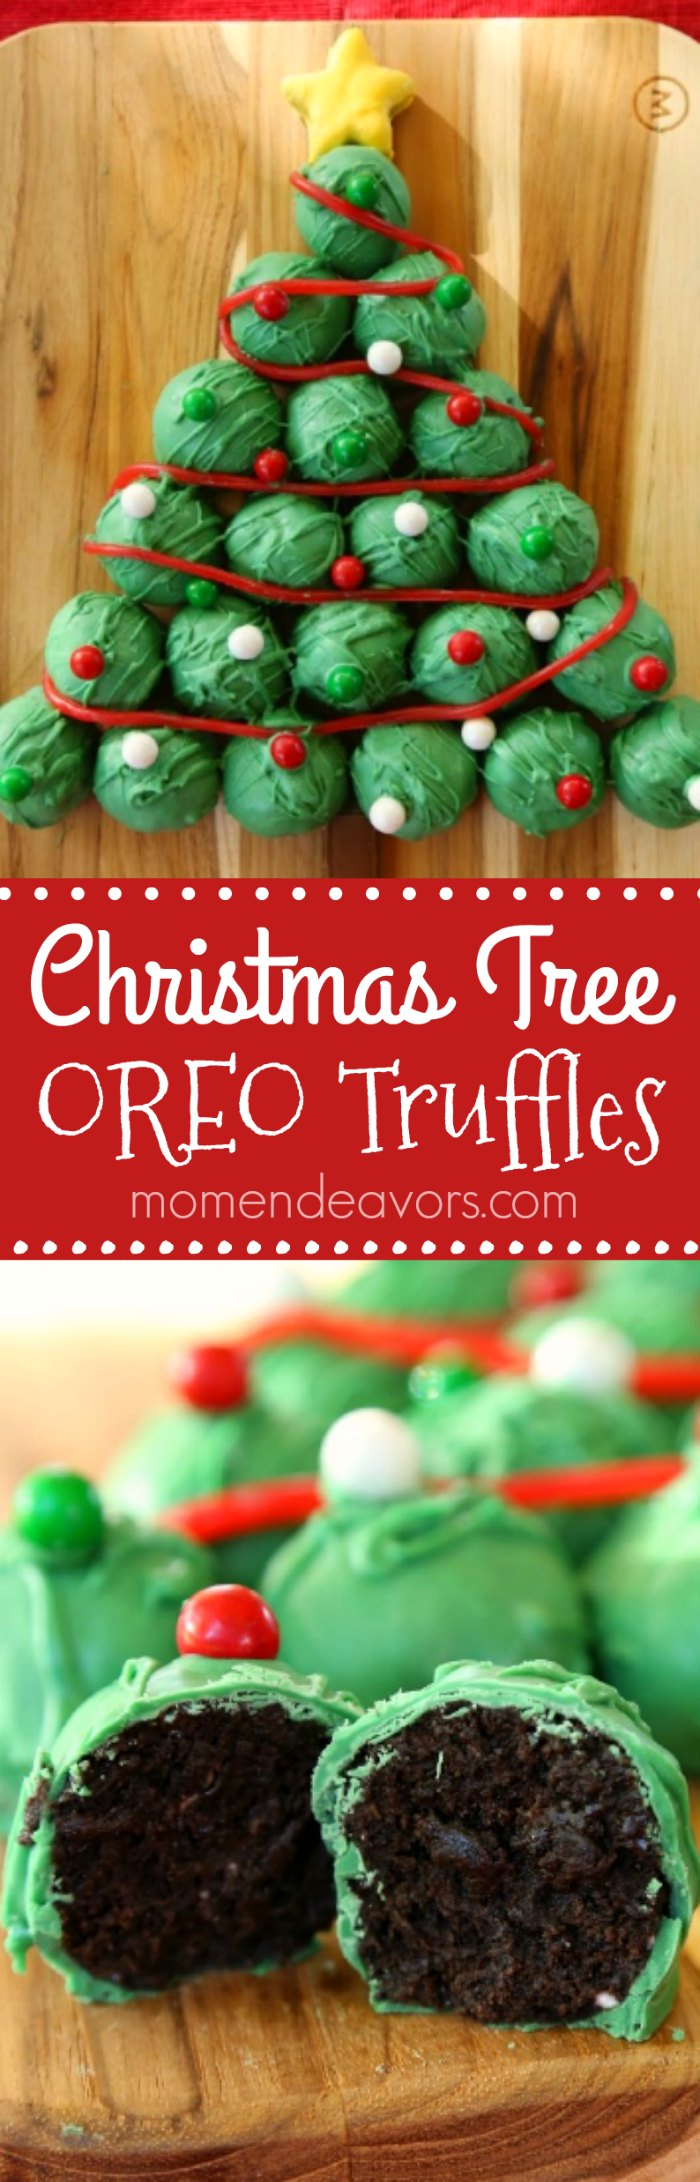 Christmas Tree Oreo Truffles